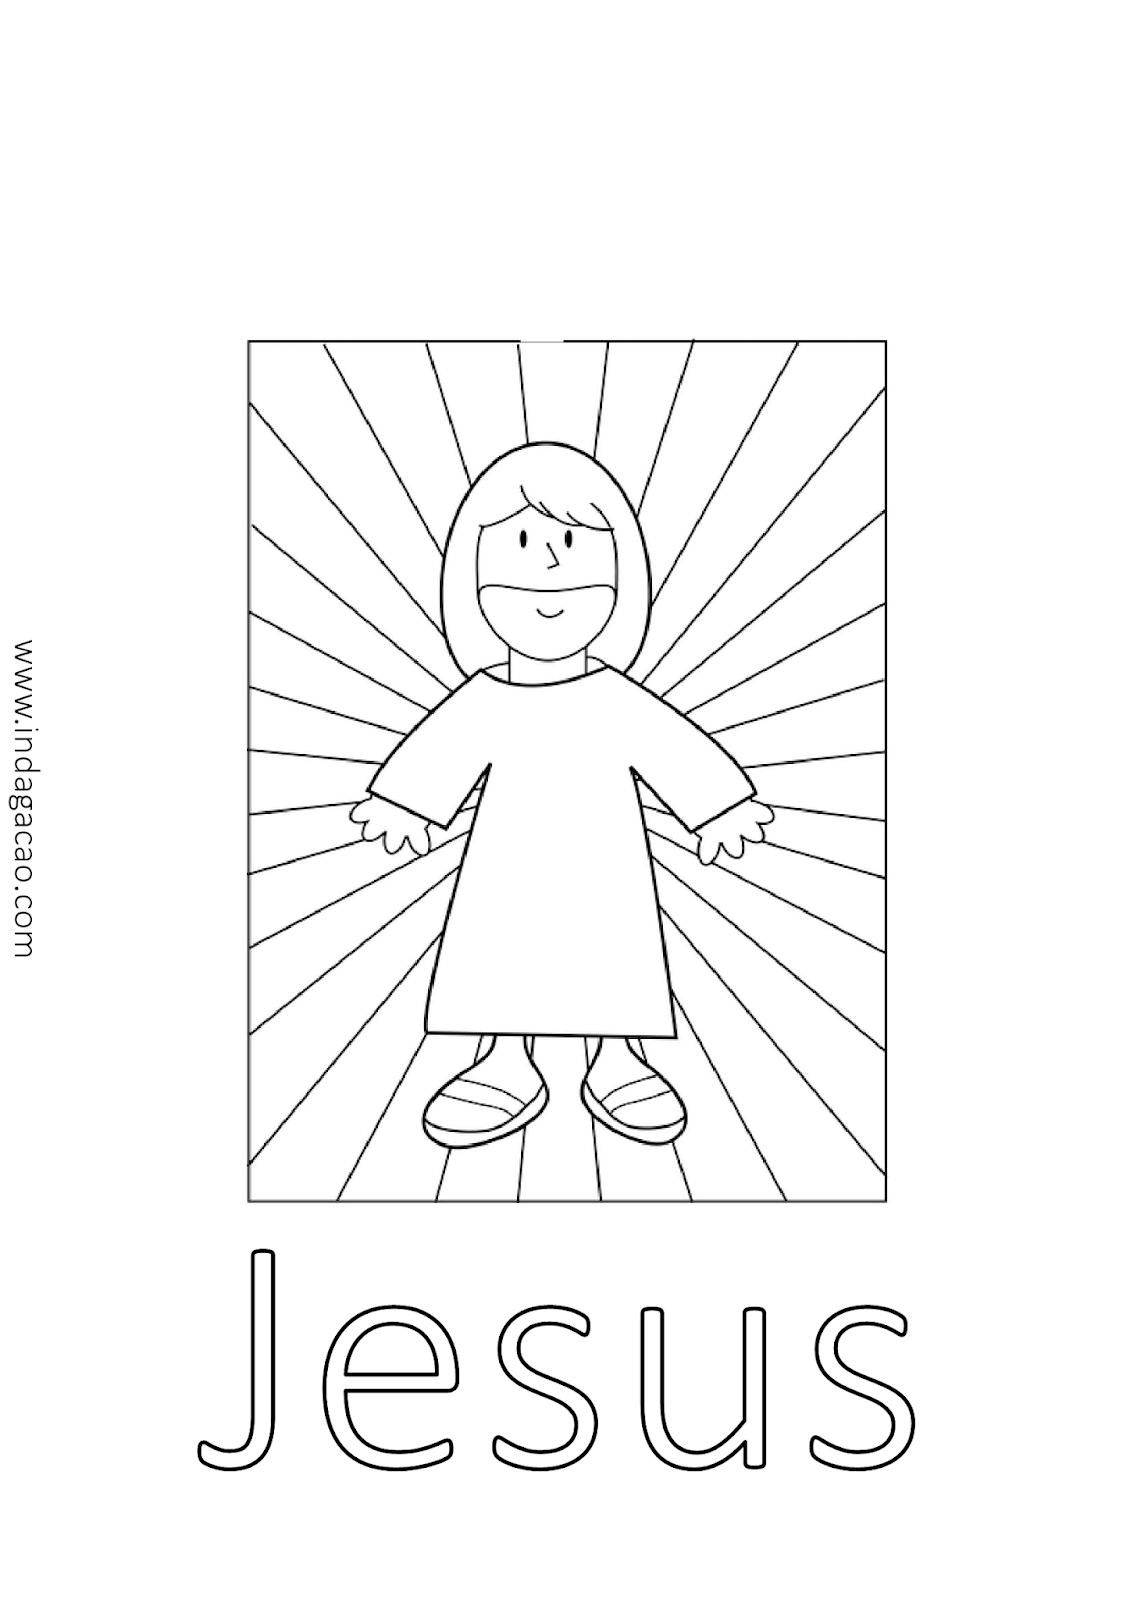 Desenho De Jesus Para Colorir Baixar Desenho Jesus Desenhos De